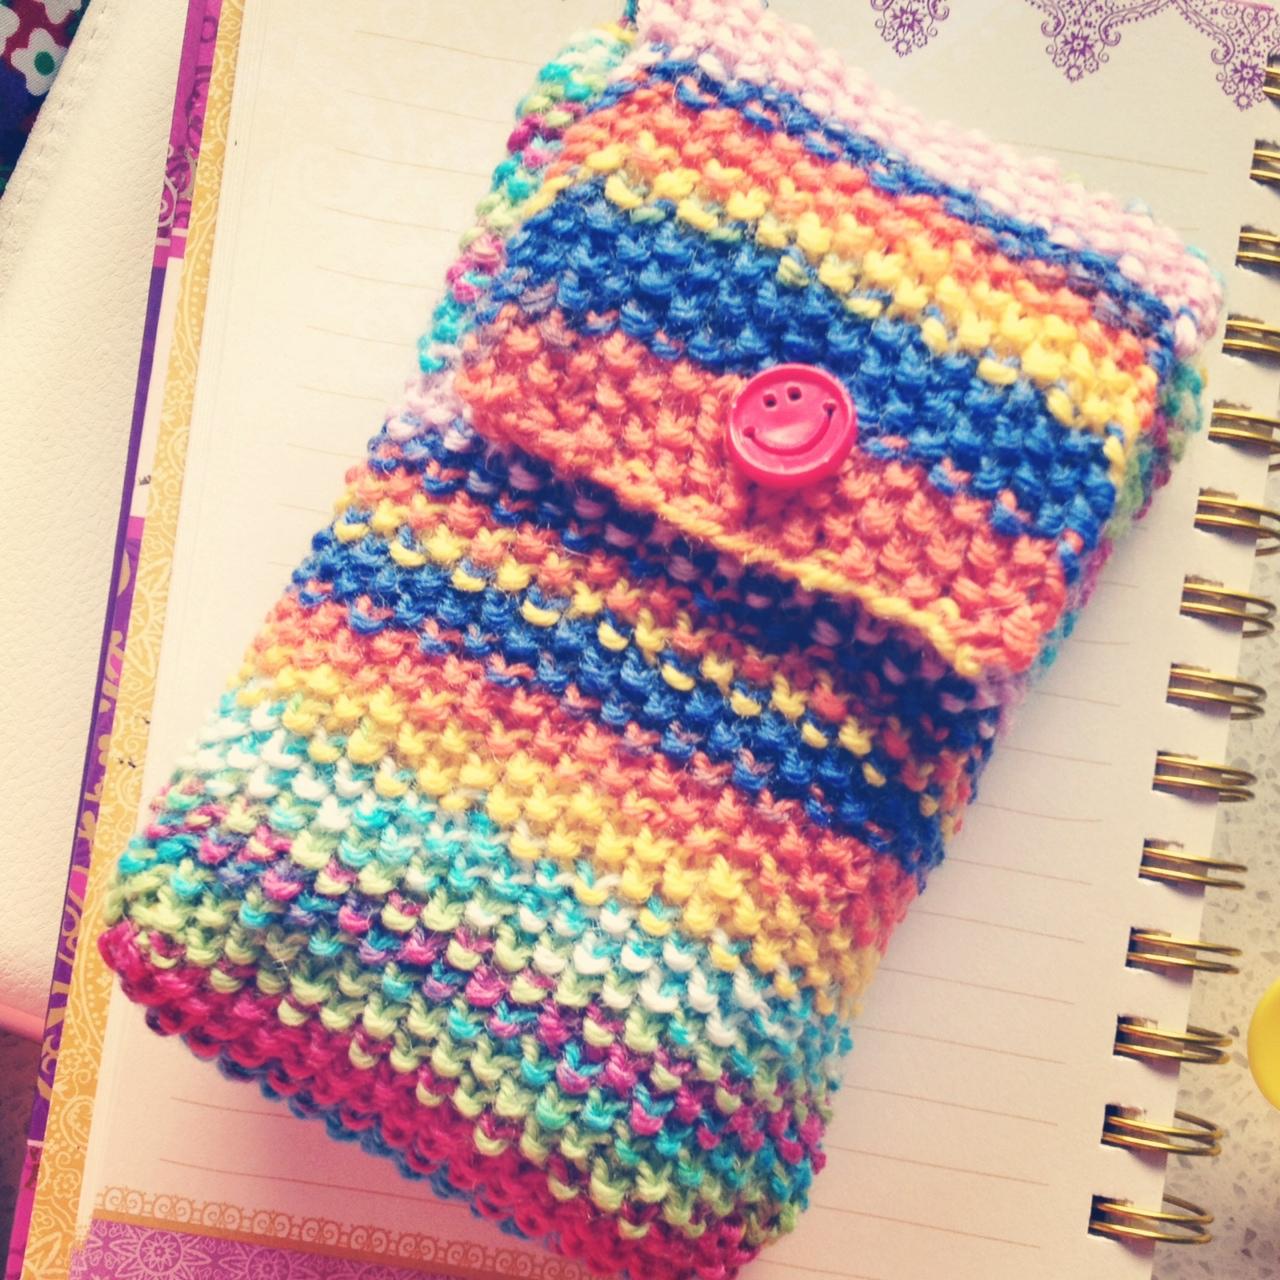 Knit Pattern Tarot Bag : Pennys knitted tarot bag